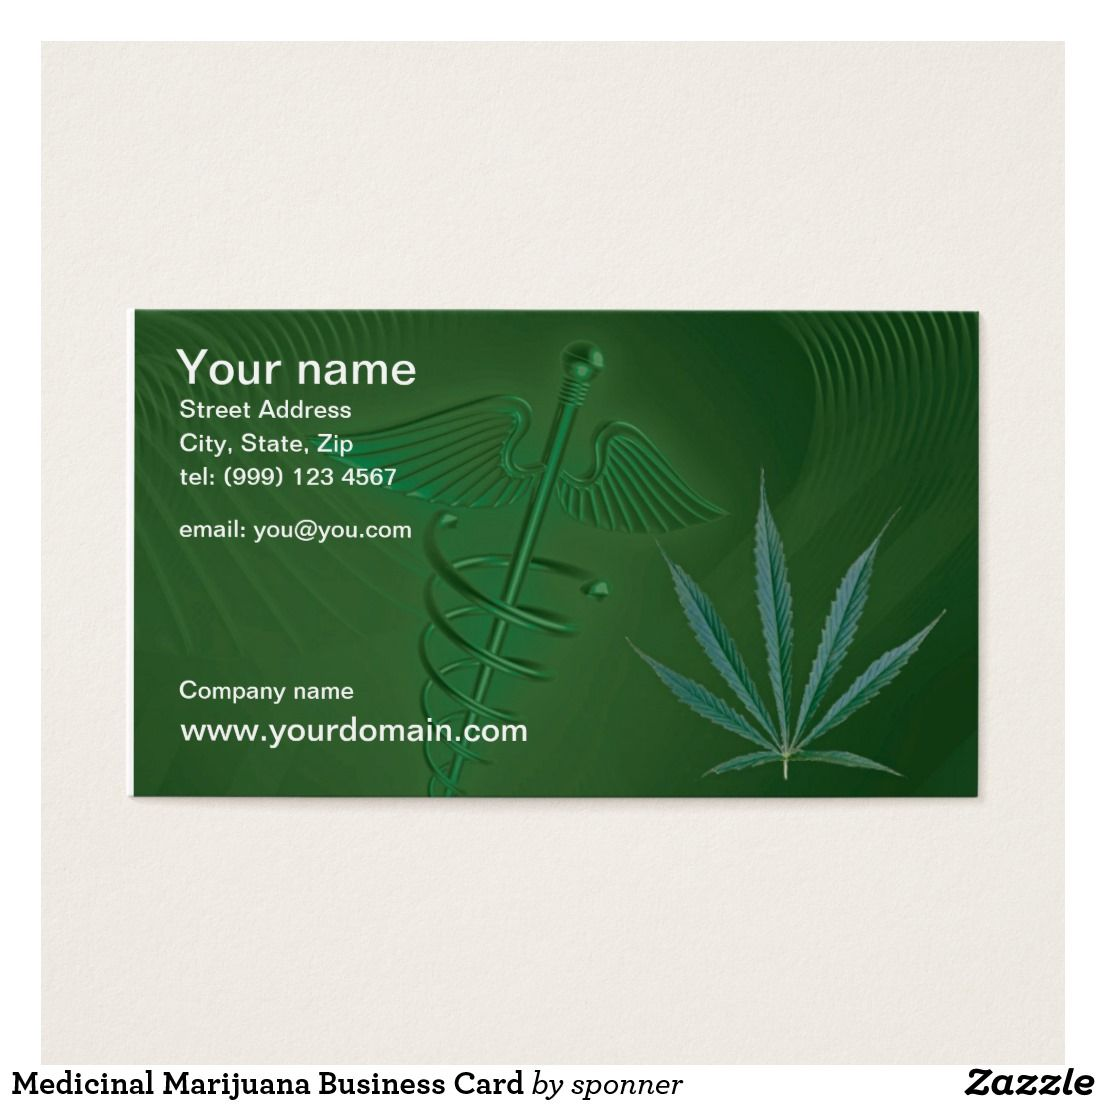 Medicinal Marijuana Business Card Check out more business card ...